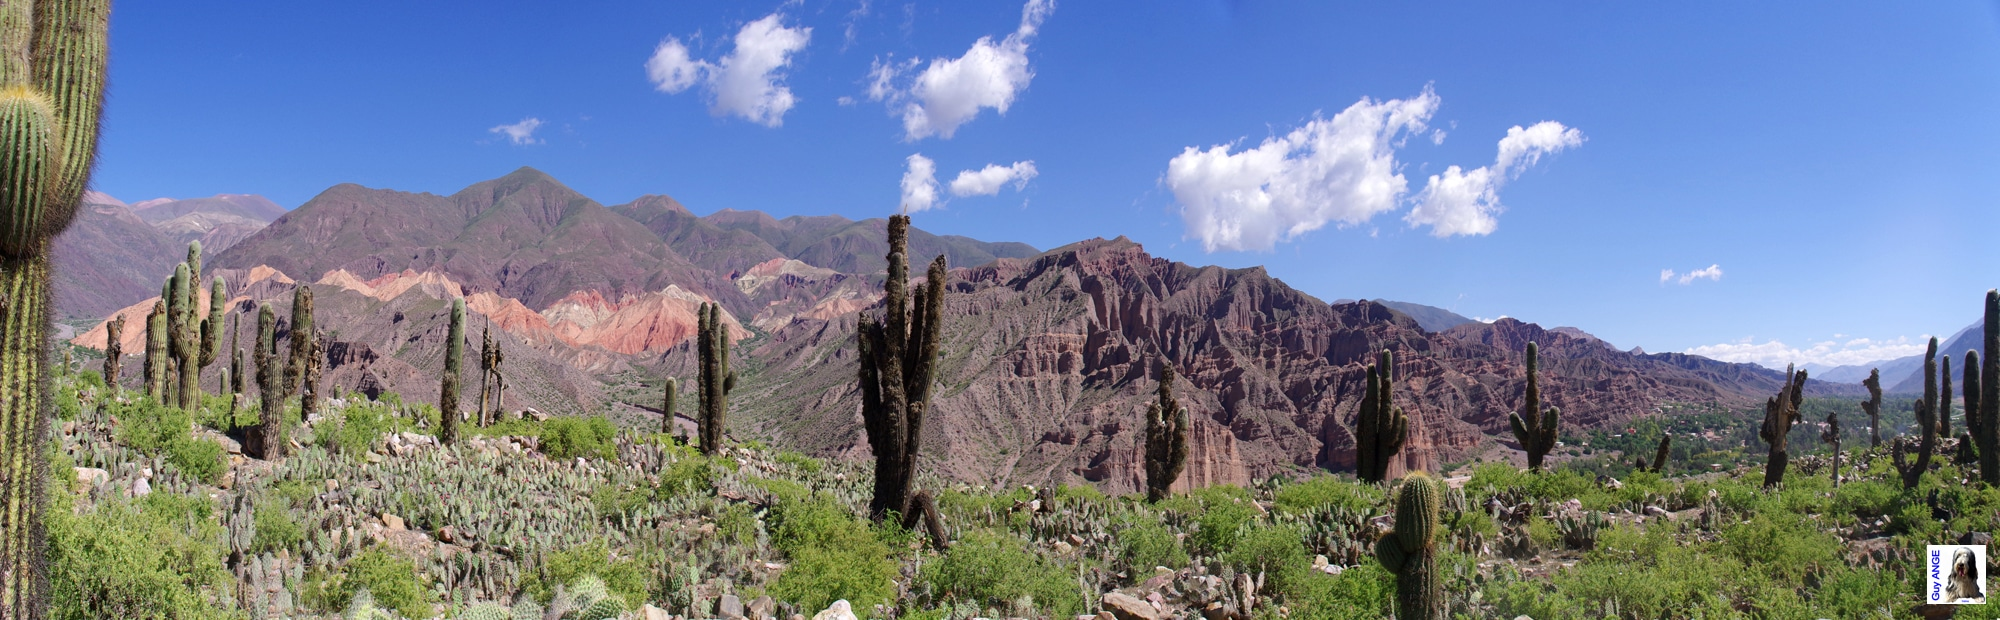 La Quebrada humahuaca ici au niveau de Maimara.